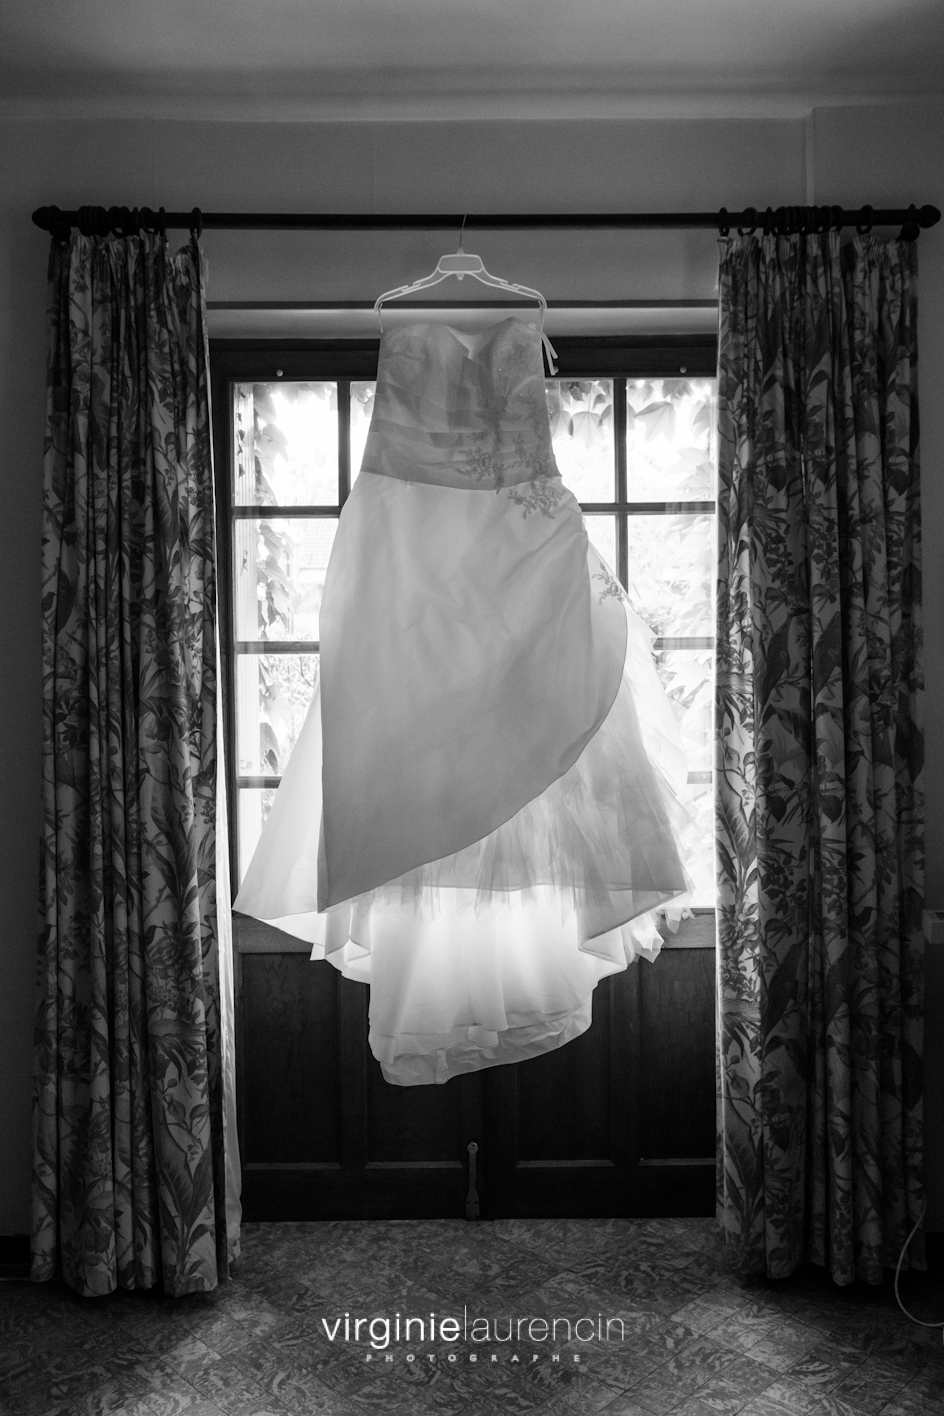 Virginie Laurencin Photographe mariage CetJB_10